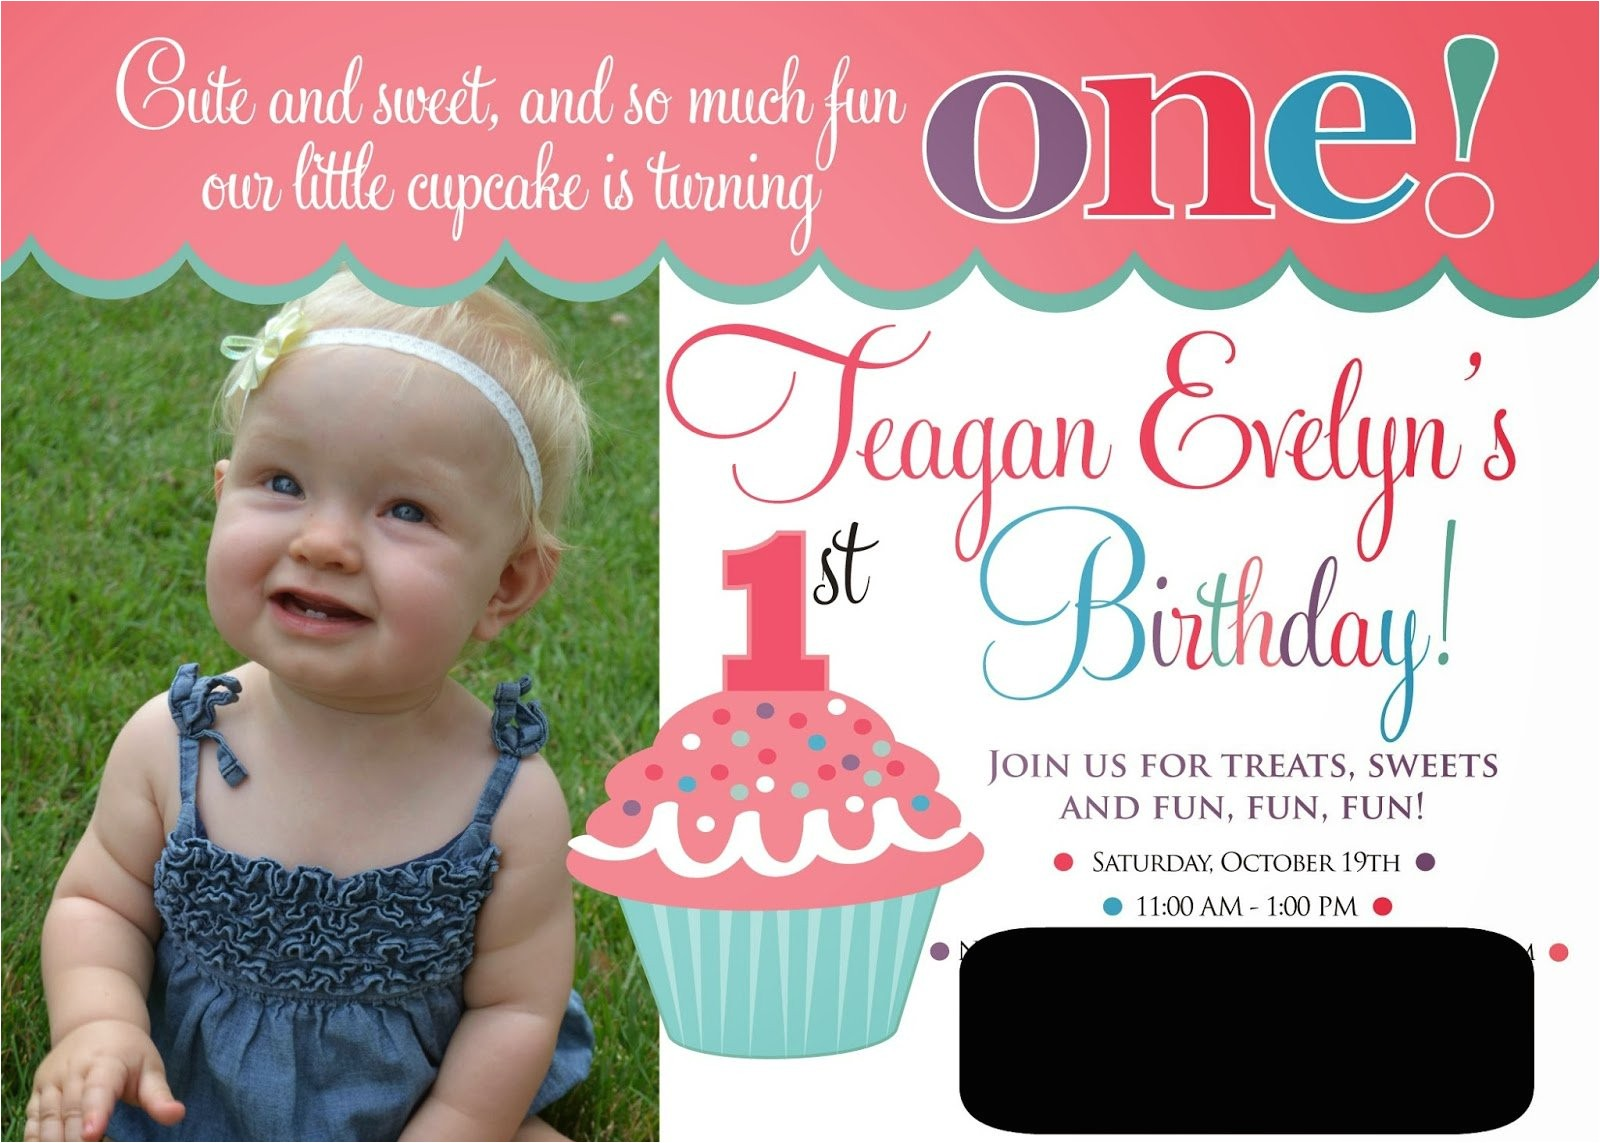 e invitations for 1st birthday